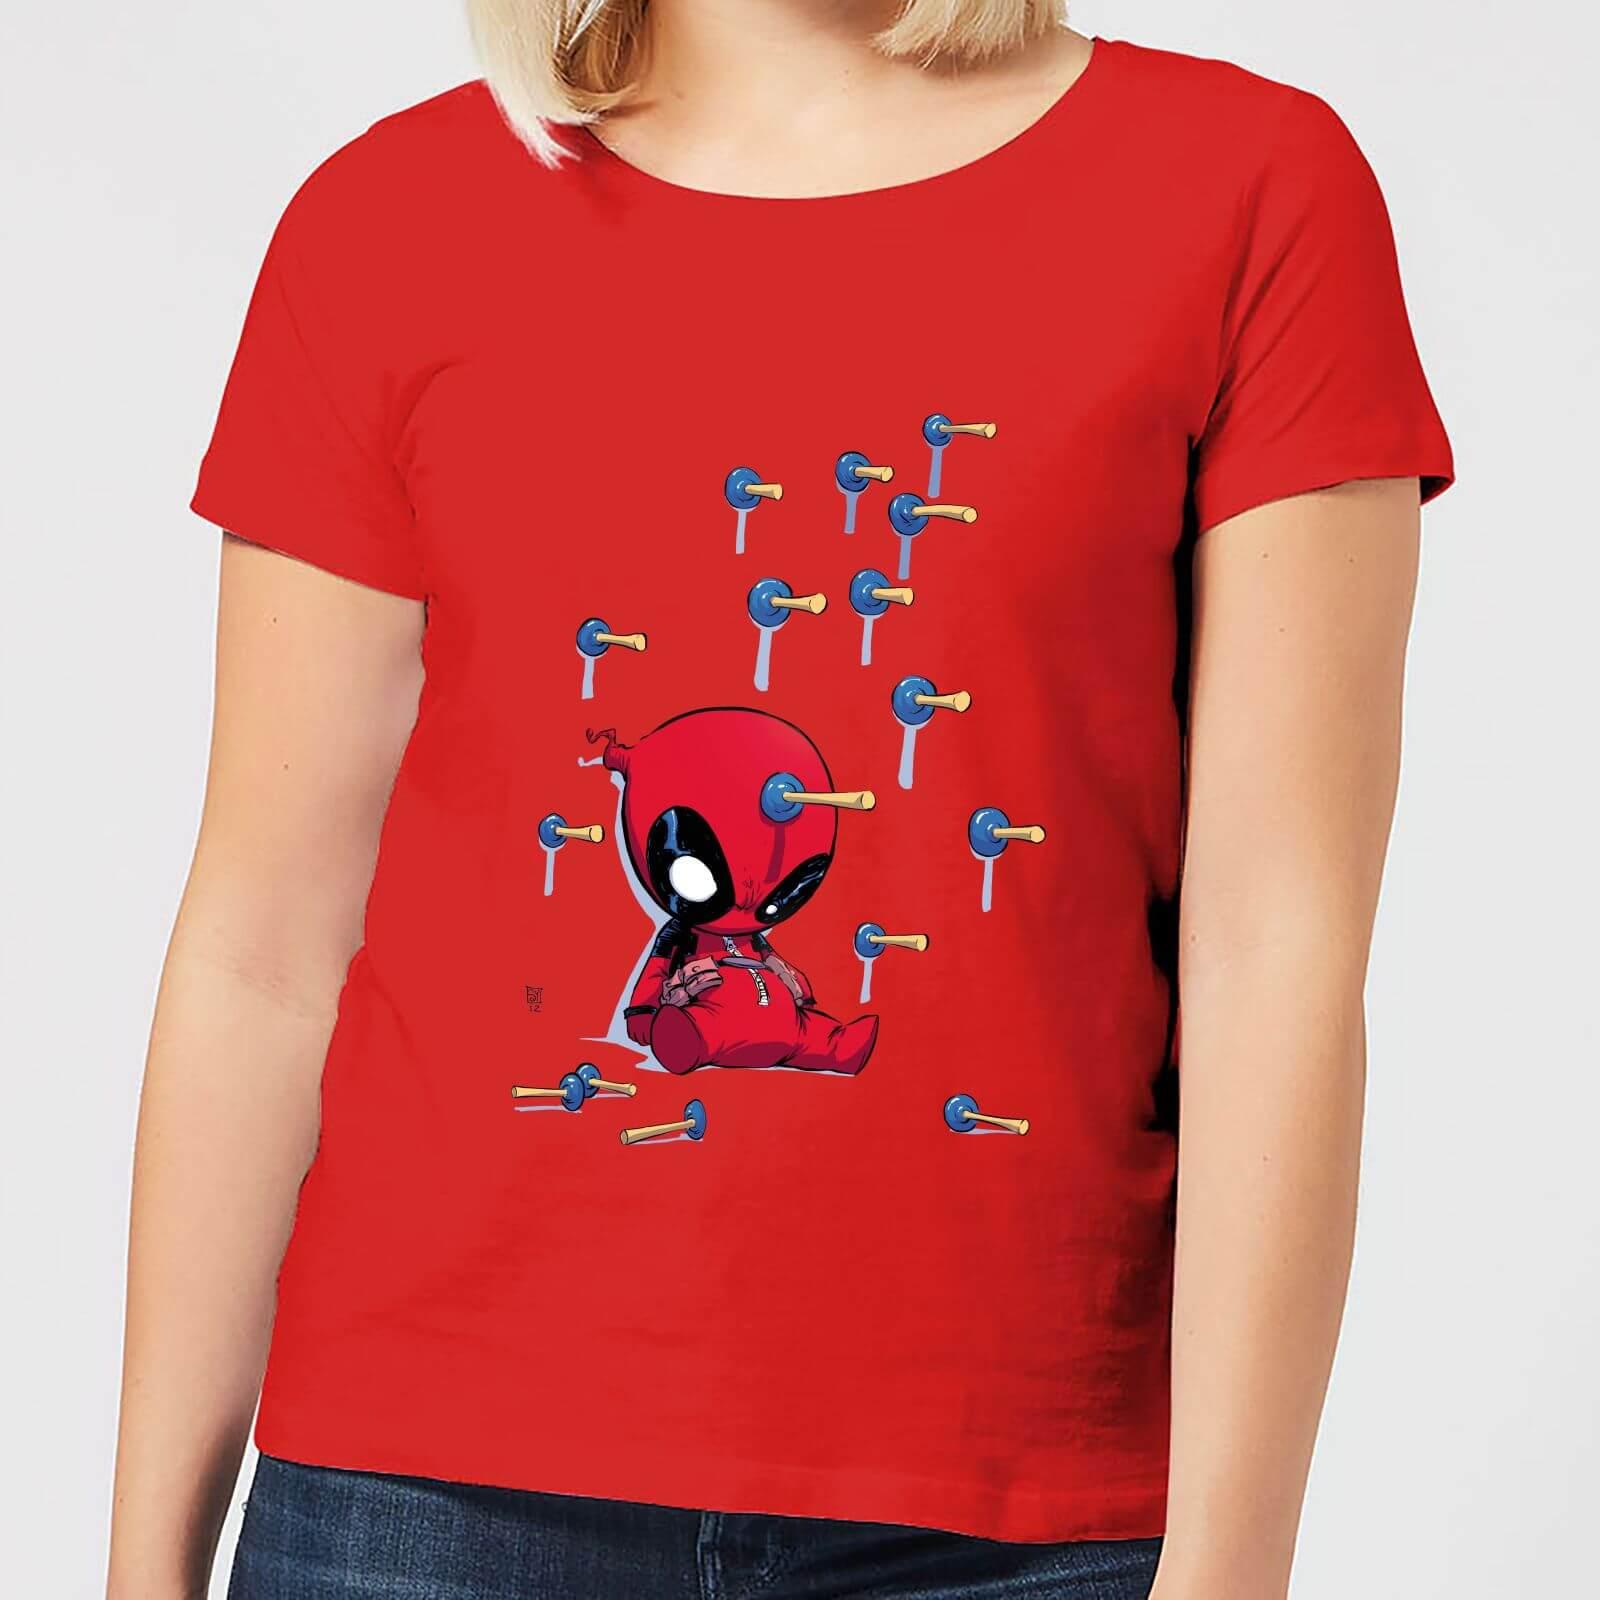 Marvel Deadpool Cartoon Knockout Women's T-Shirt - Red - M - Red